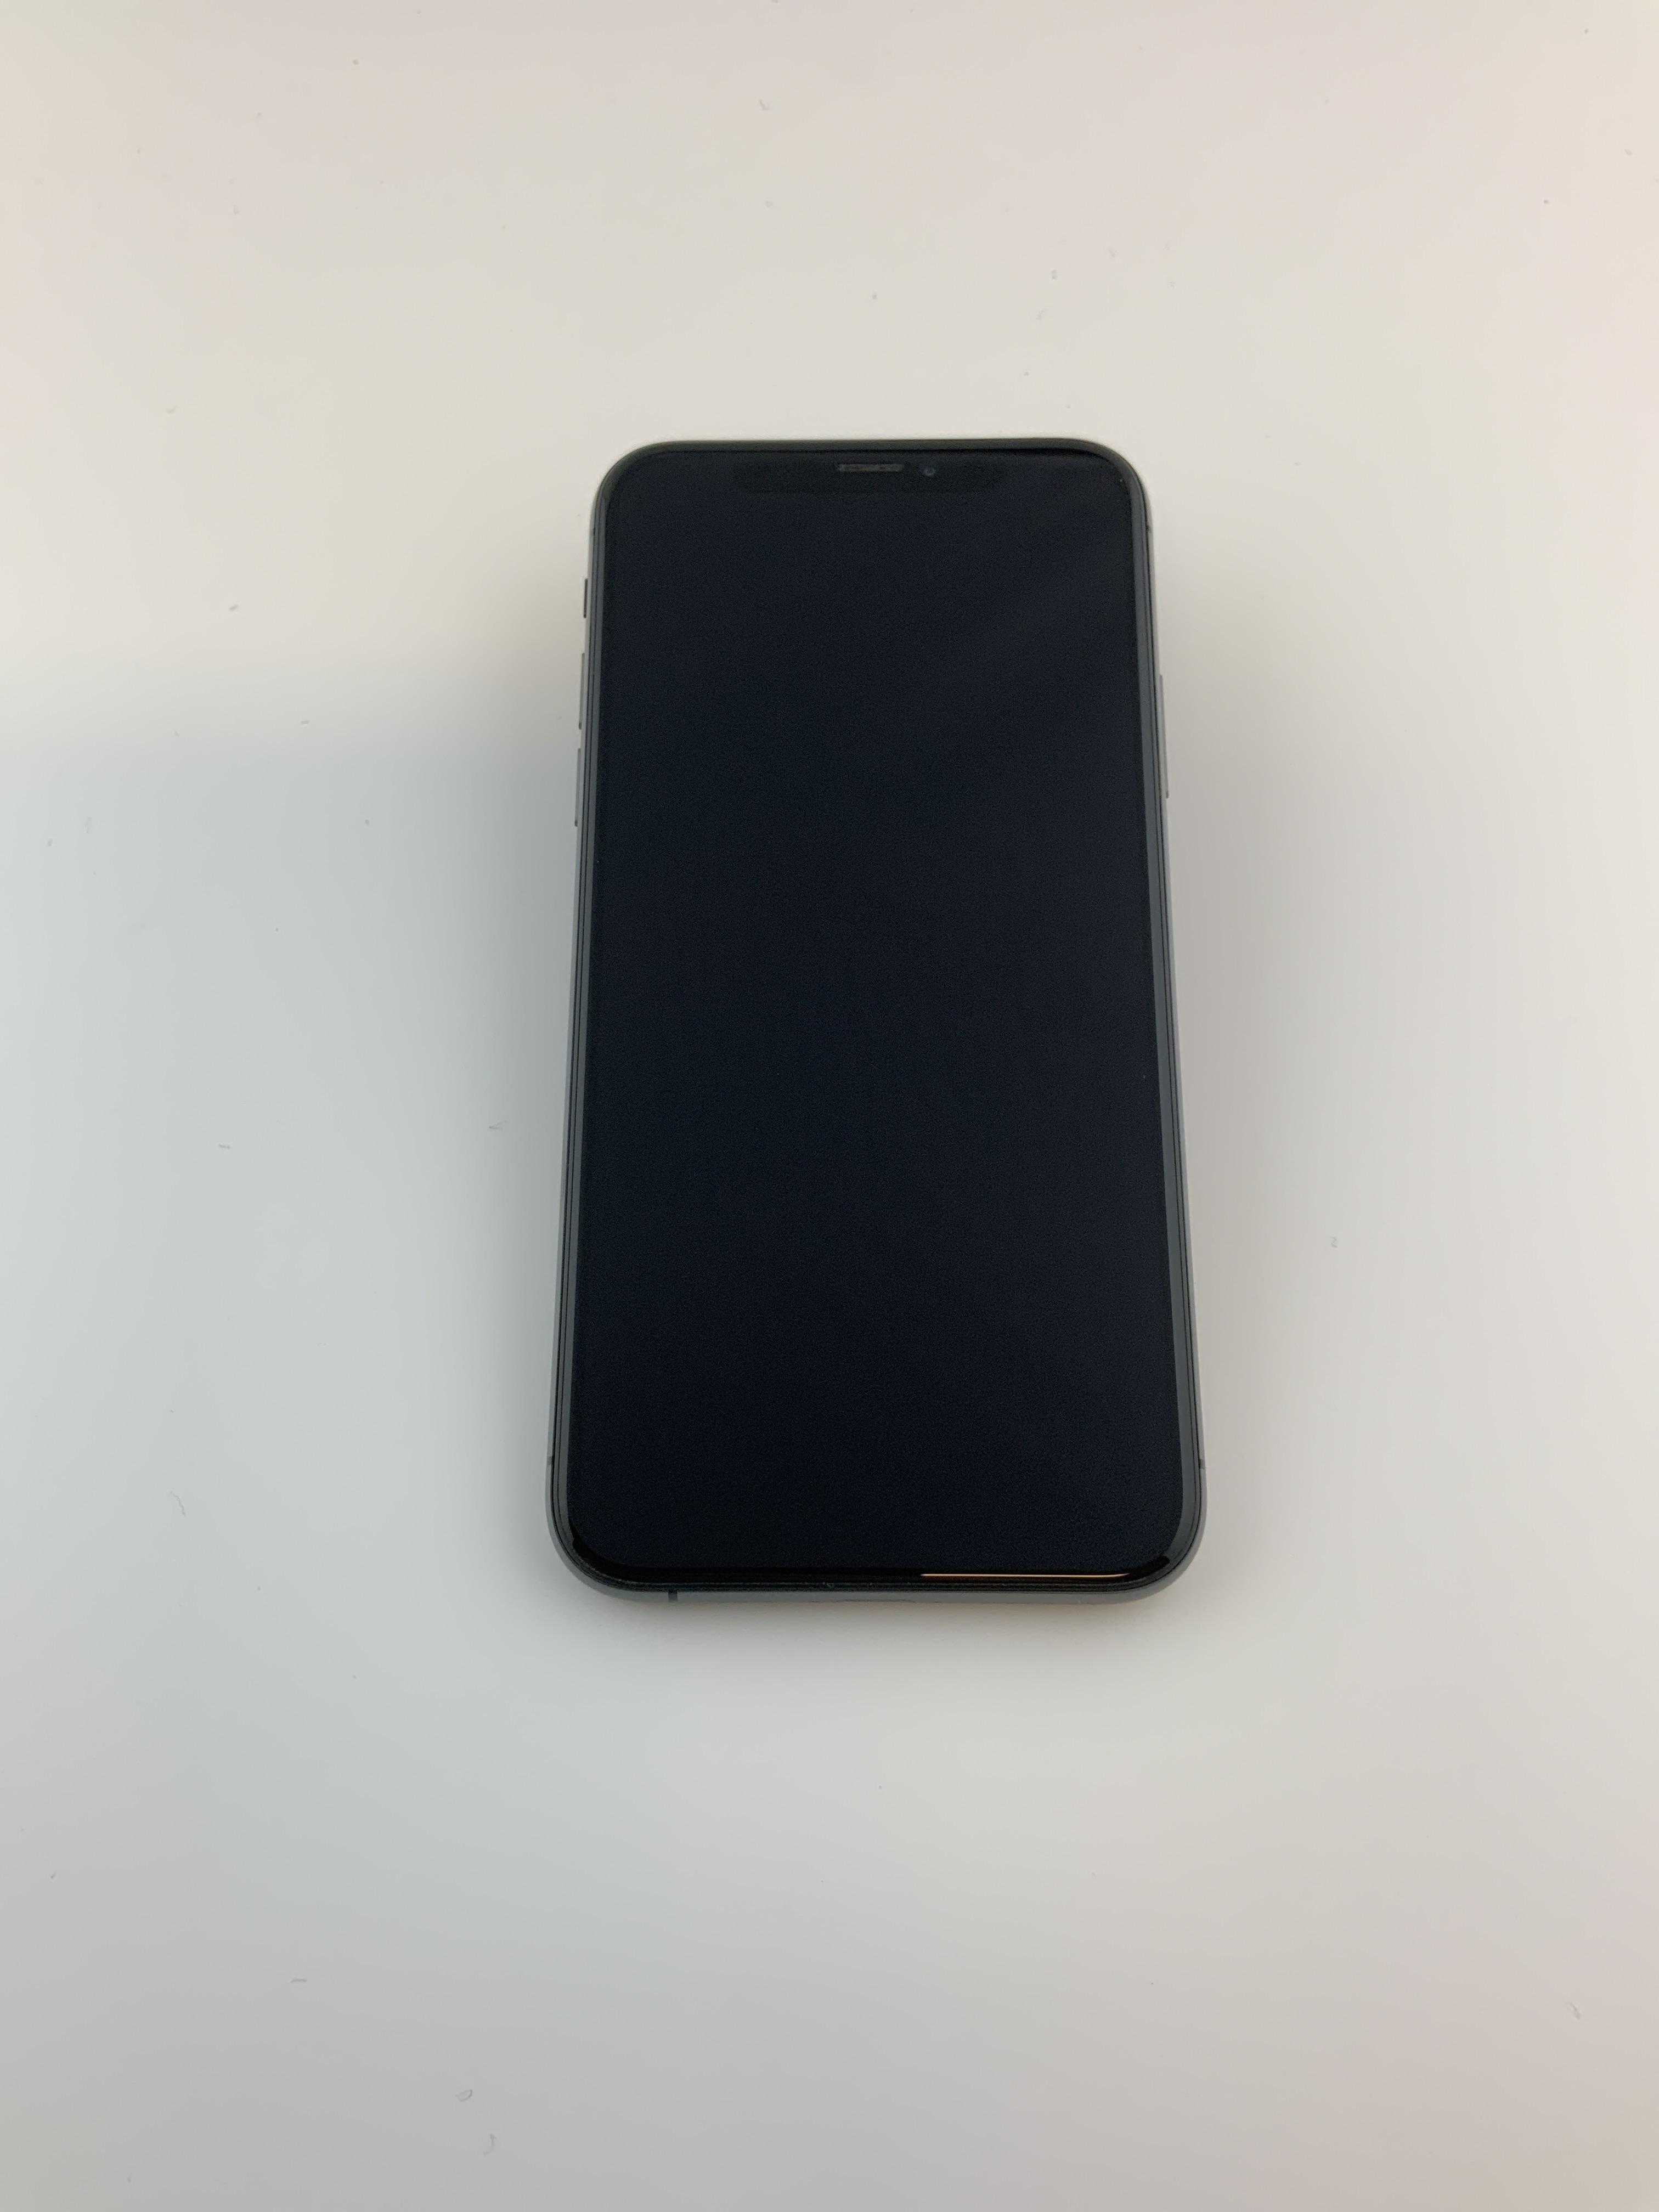 iPhone XS 64GB, 64GB, Space Gray, image 1